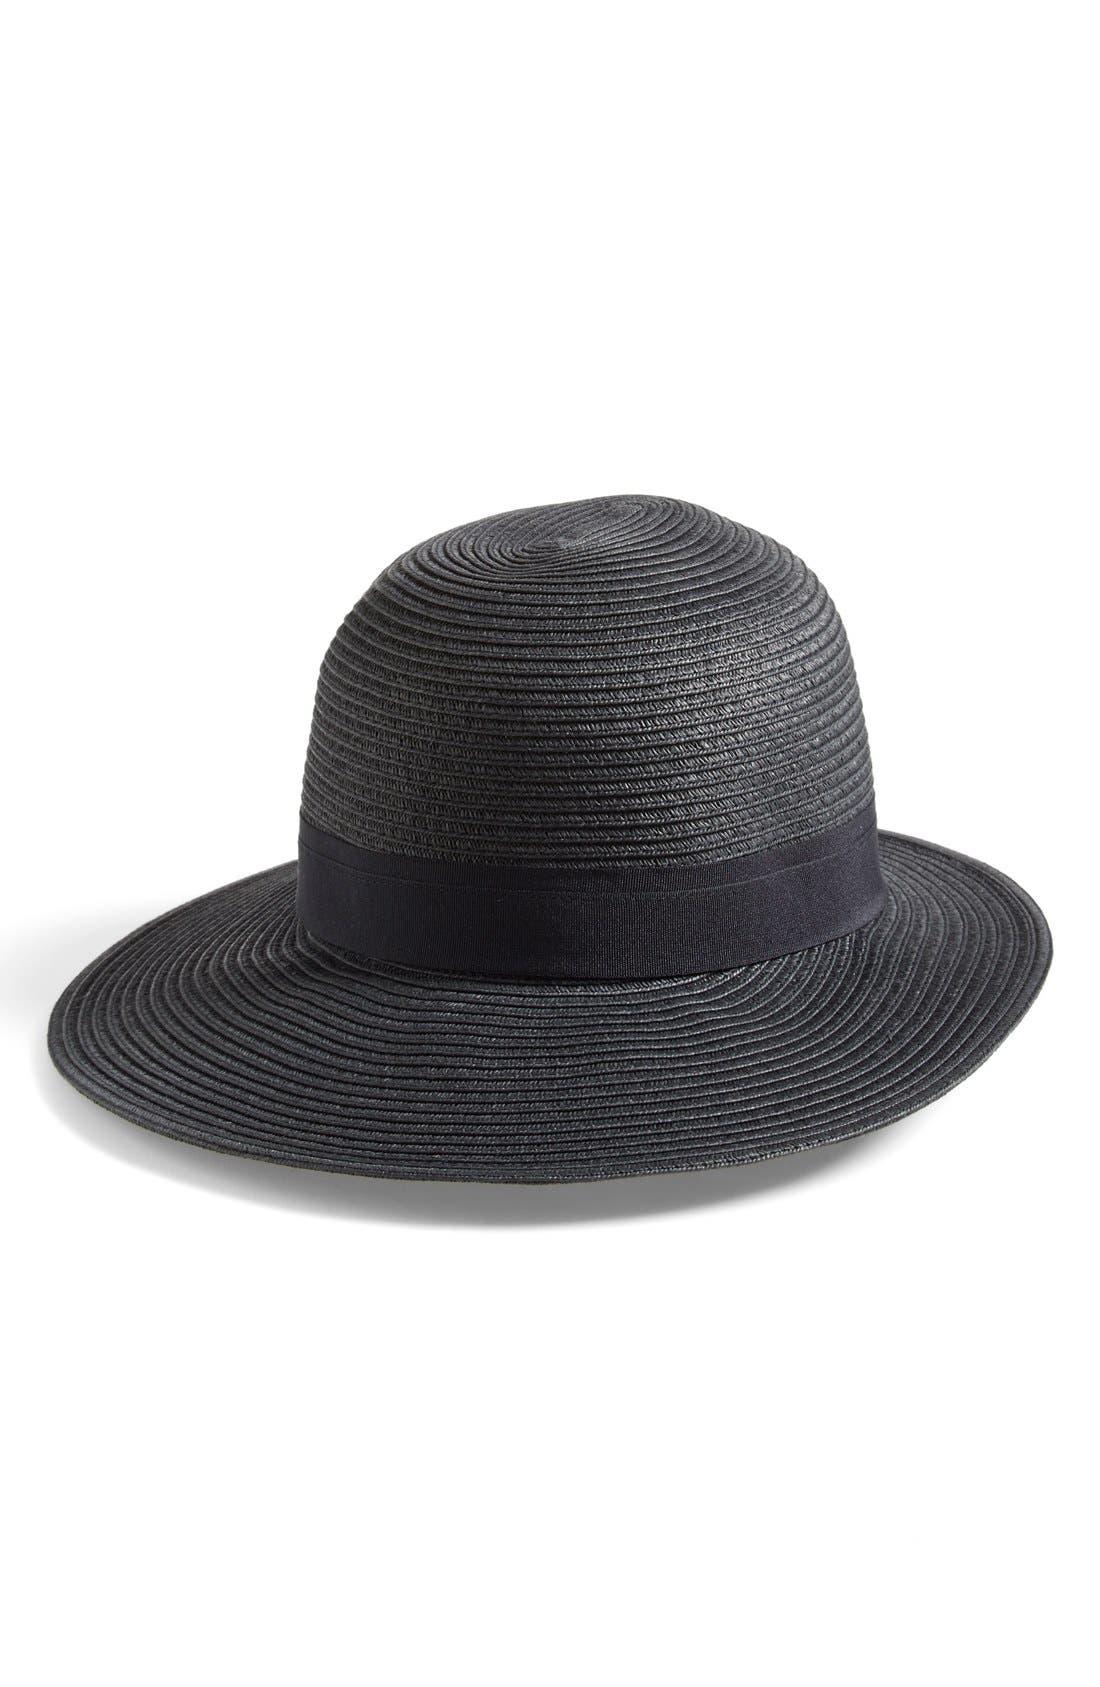 Asymmetrical Brim Floppy Hat,                             Main thumbnail 1, color,                             001